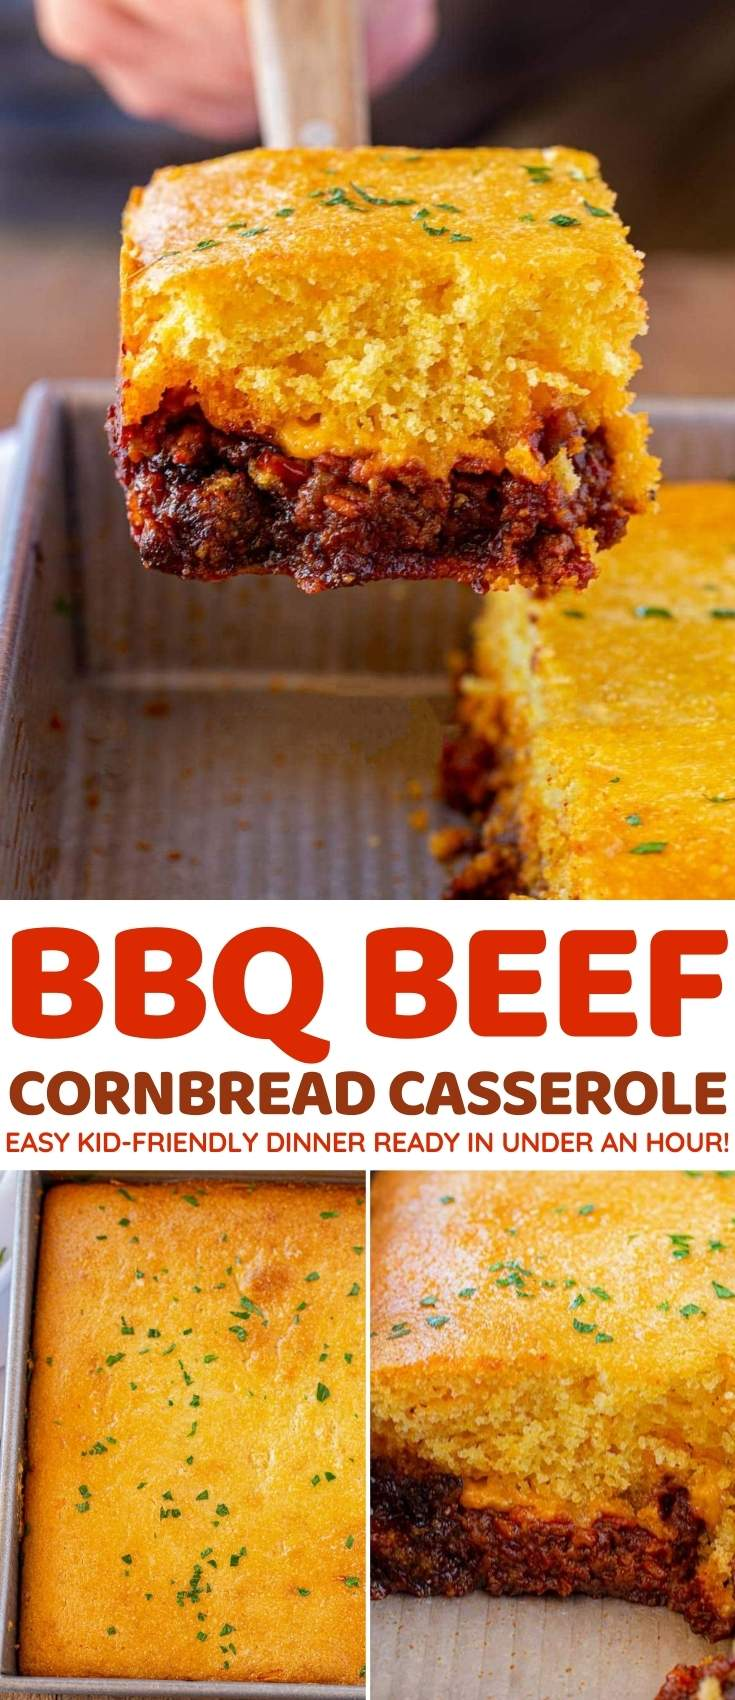 BBQ Beef Cornbread Casserole collage